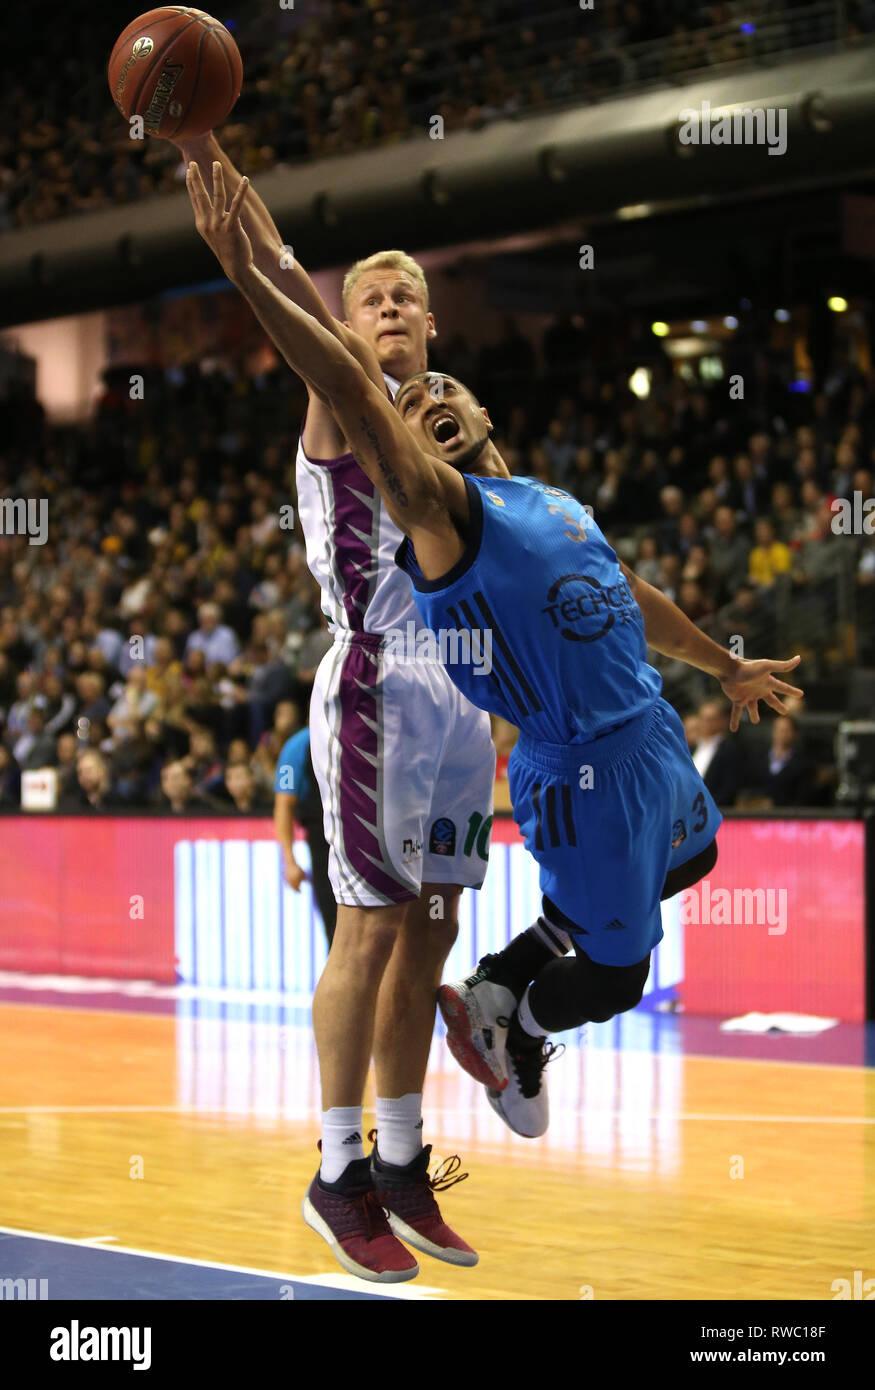 05 de marzo de 2019, Berlín: baloncesto: Eurocup, Alba Berlin ...